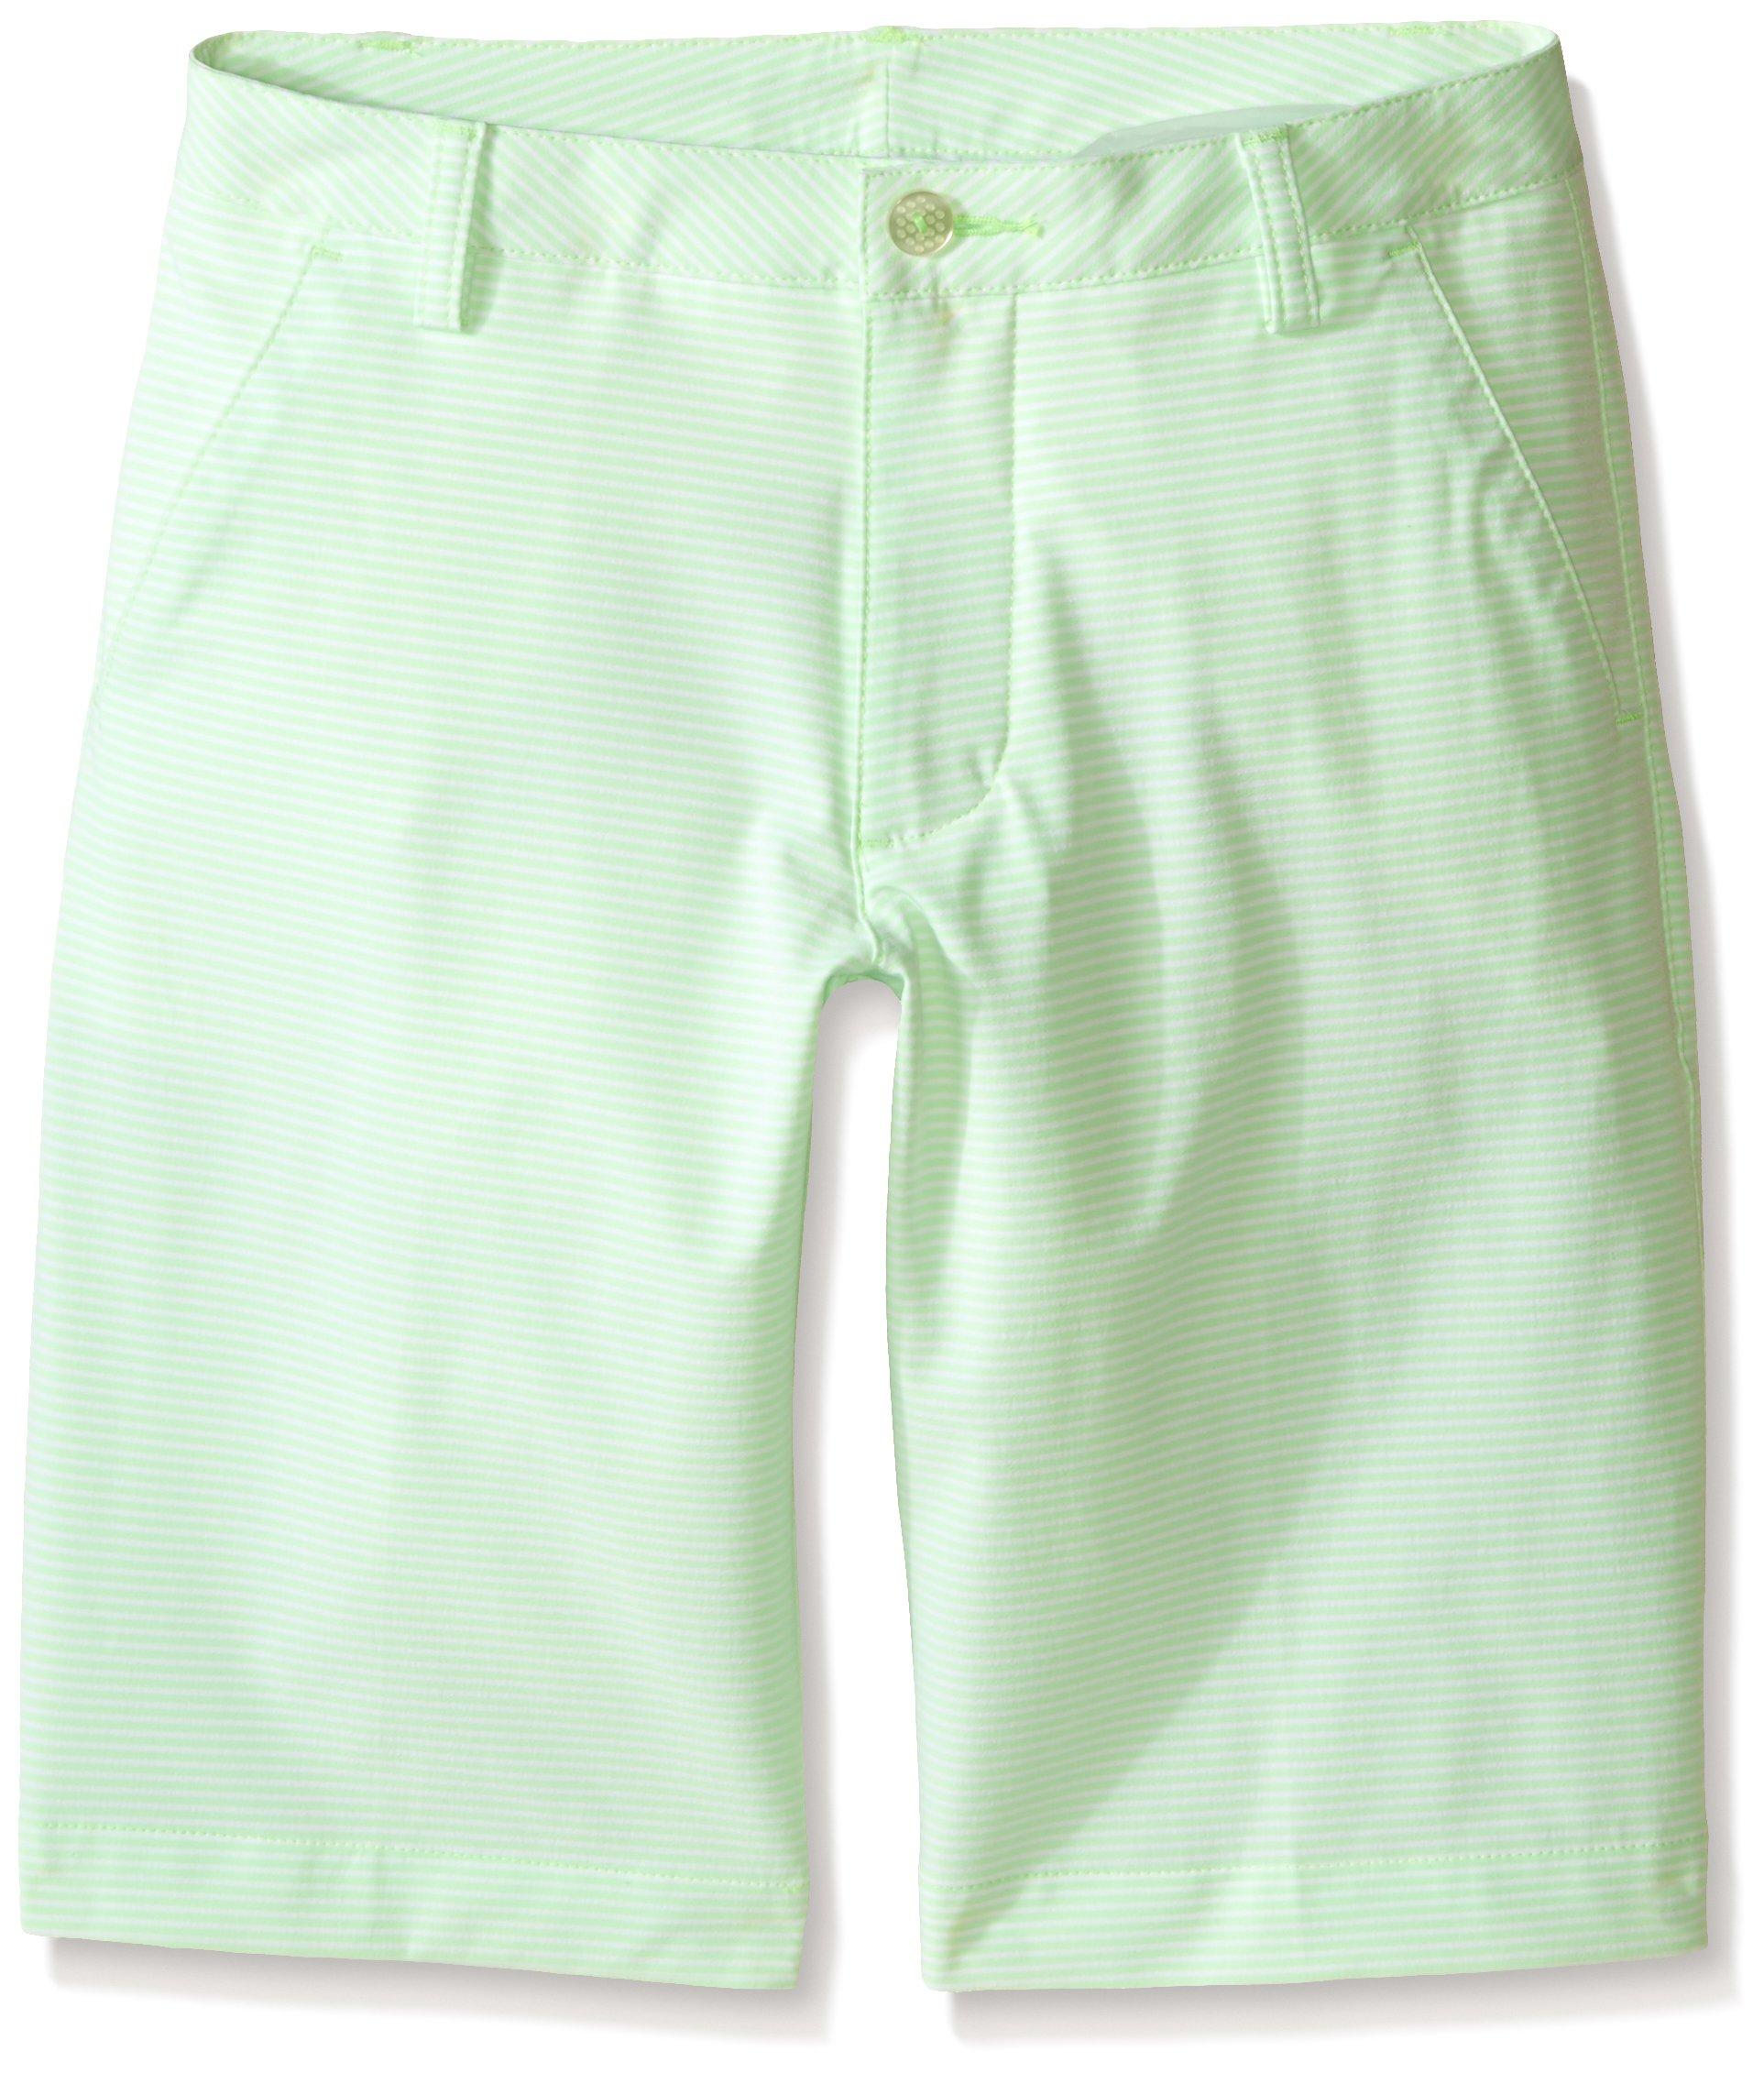 PUMA Golf Boys' Stripe It Shorts (Big Kids), Green Gecko, Large